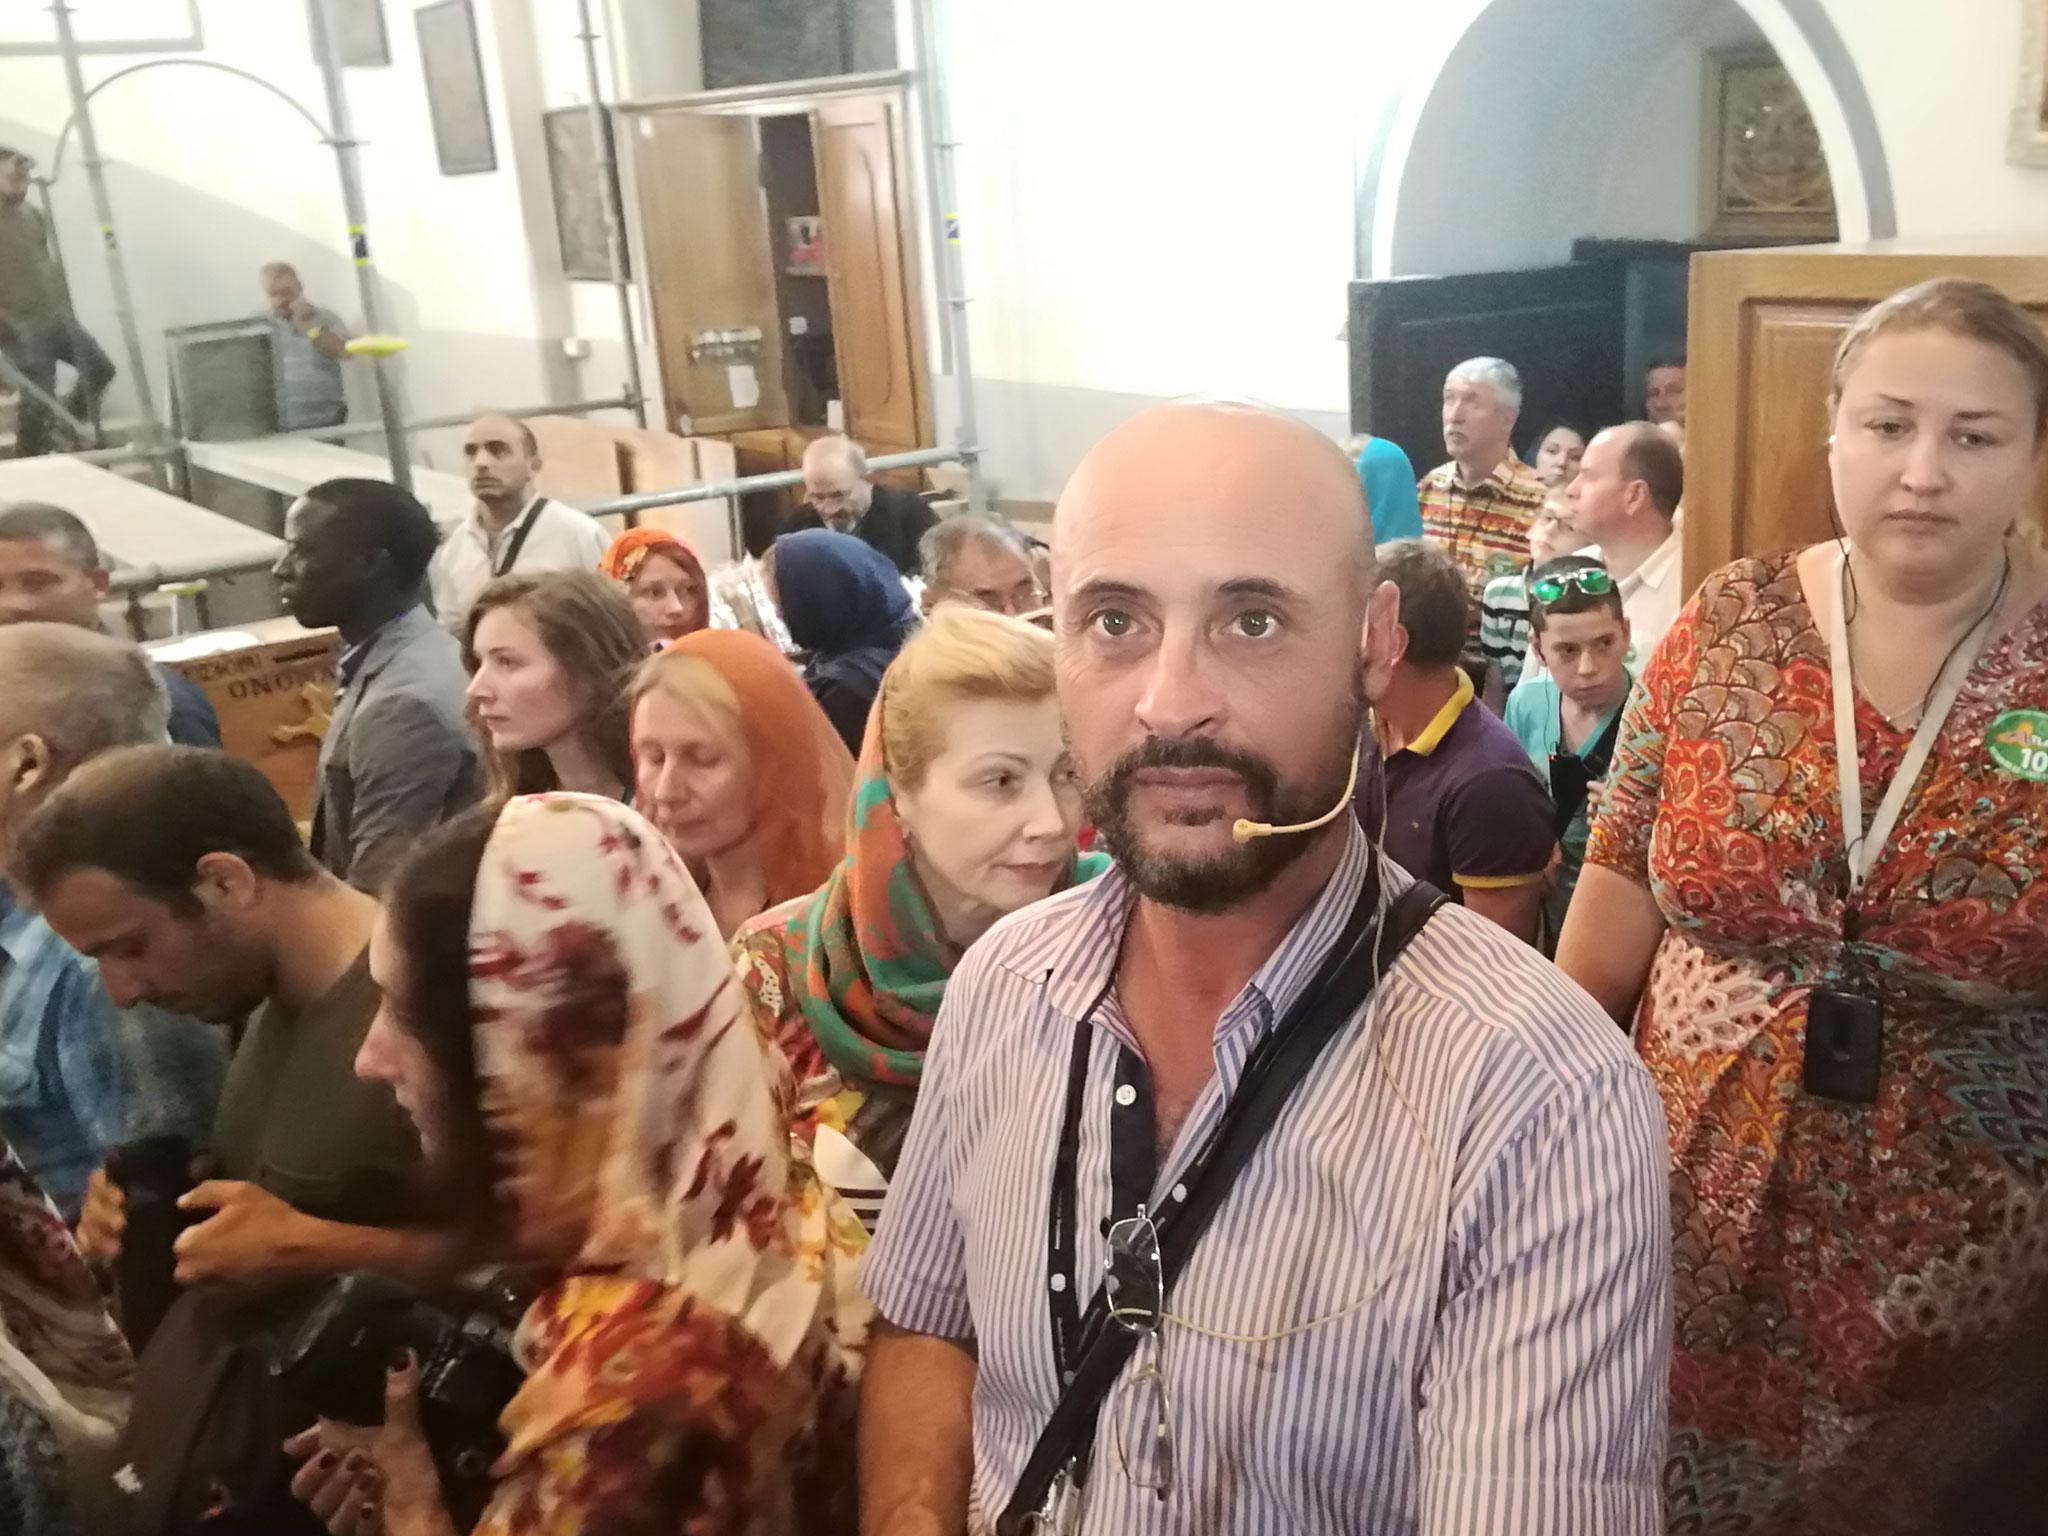 Crowds of pilgrims at the Nativity Church, Bethlehem, 2018